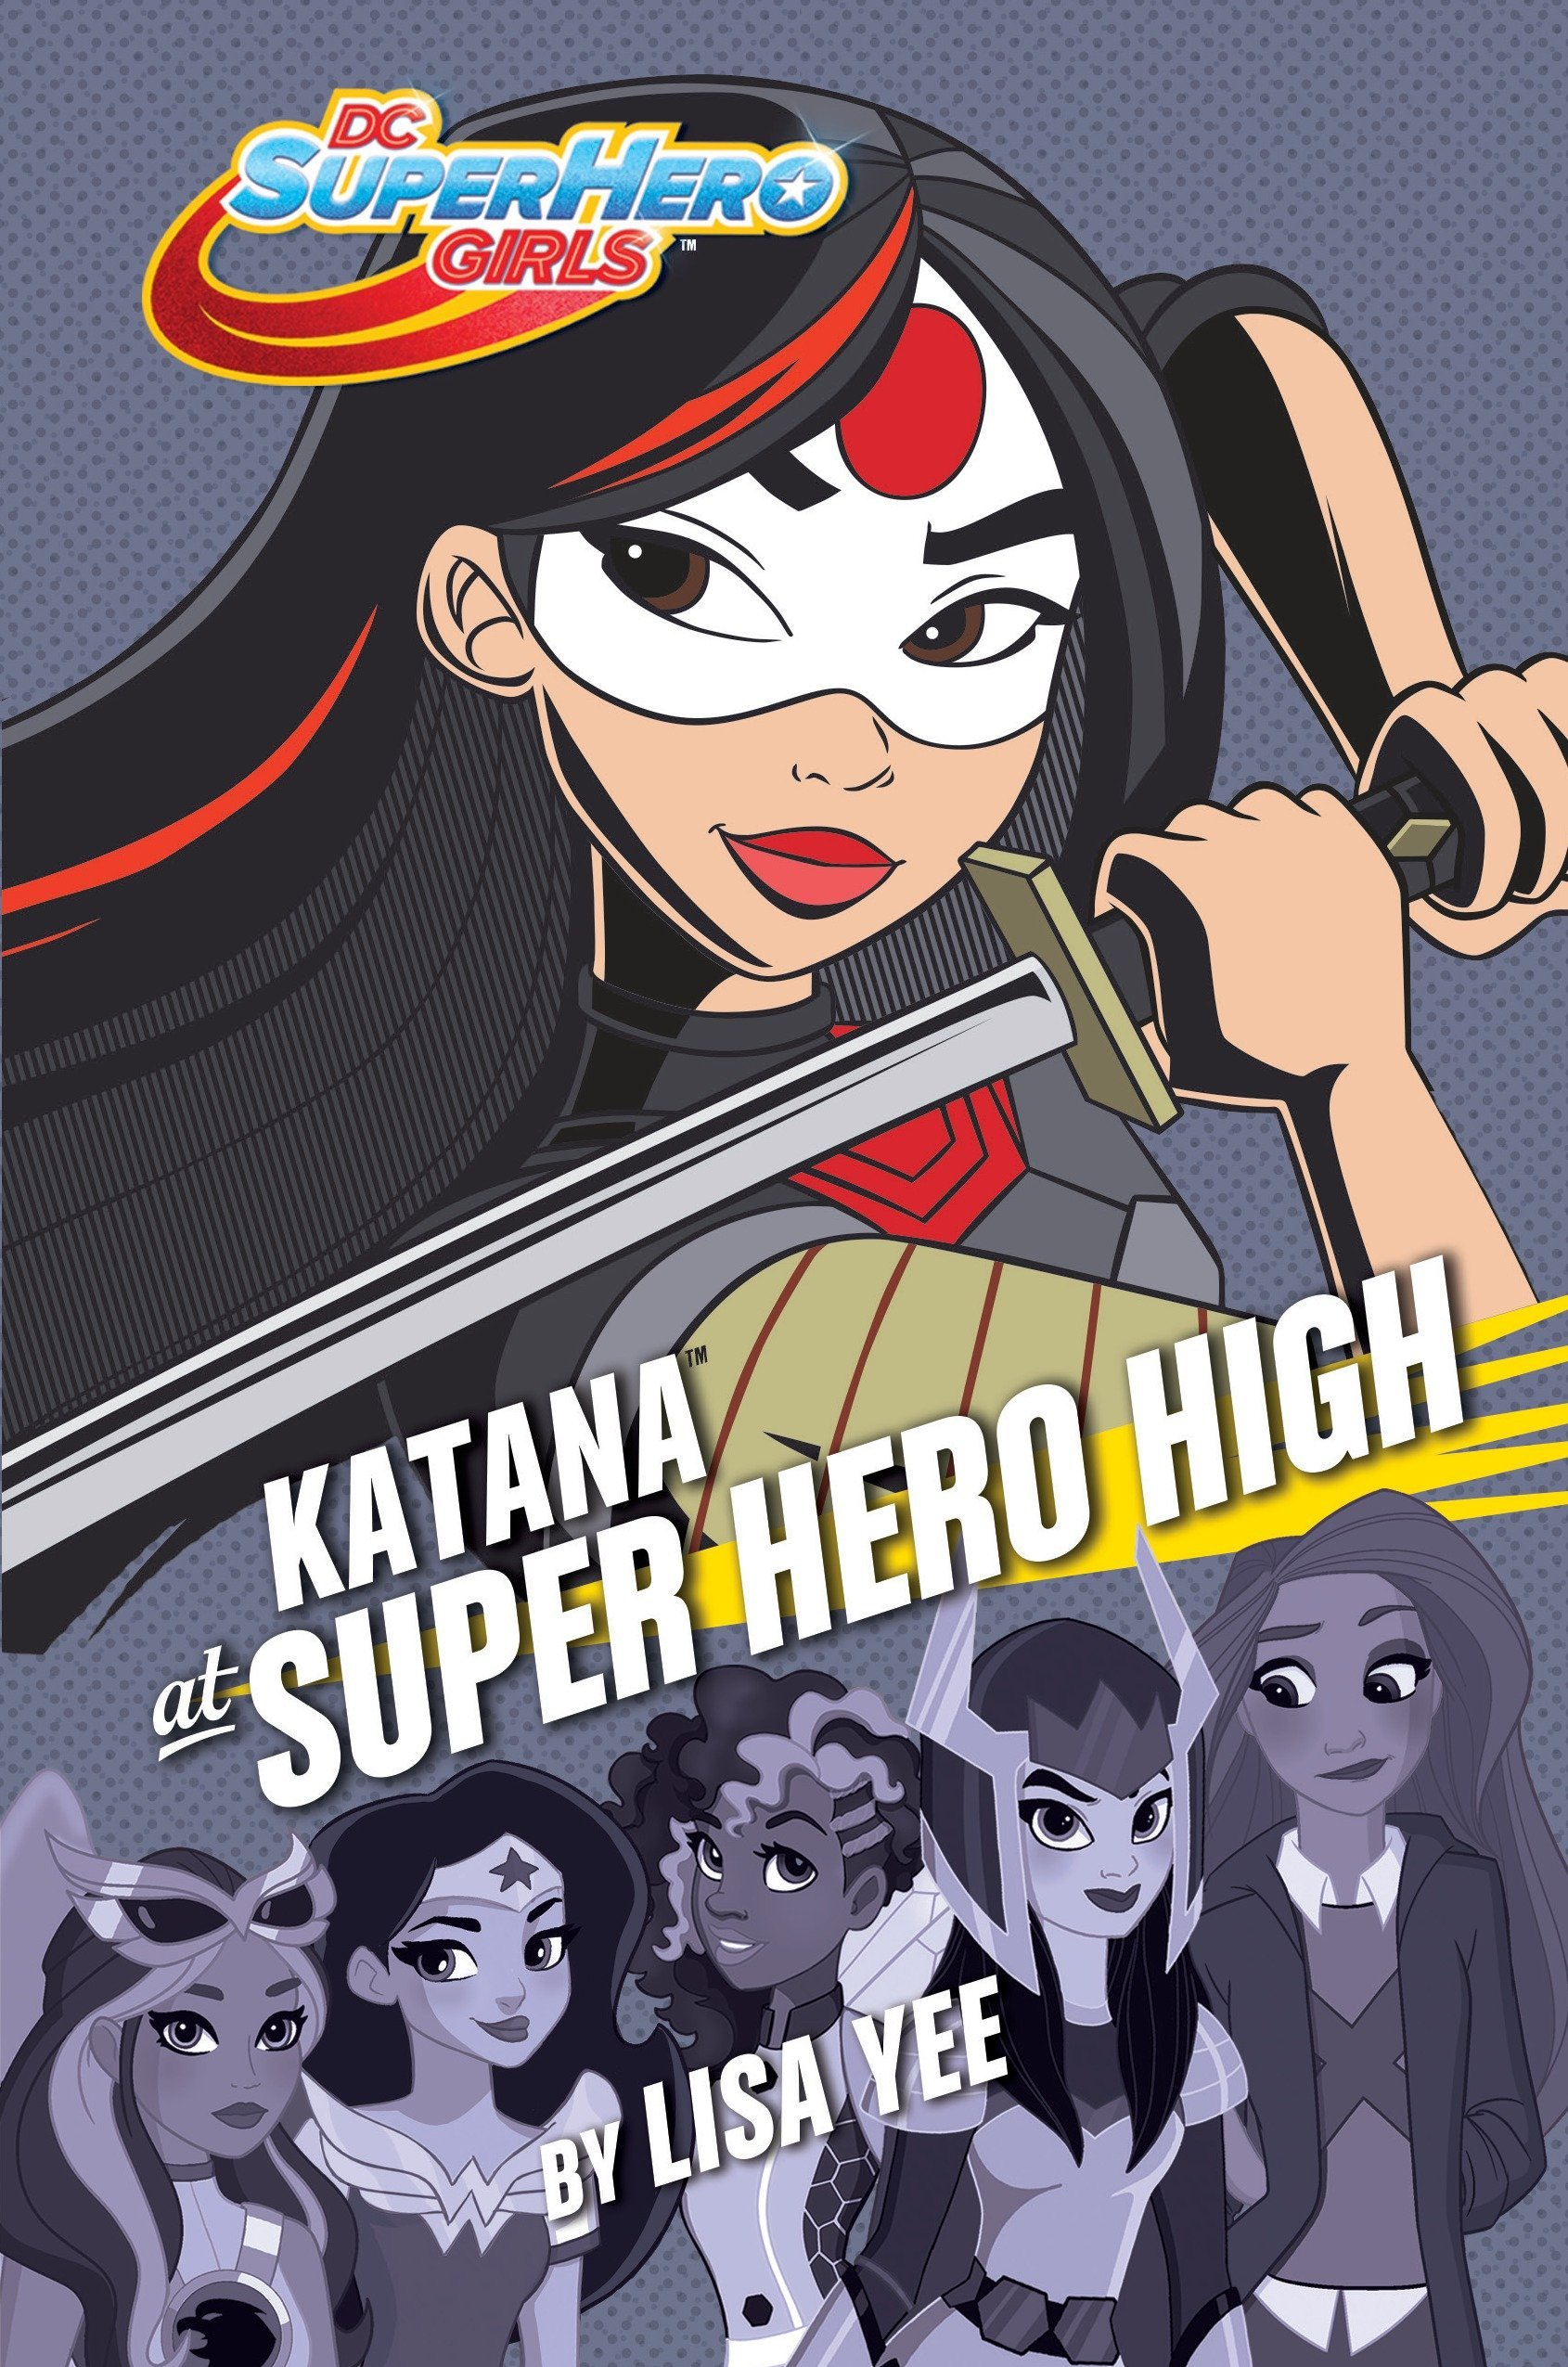 Read Online Katana at Super Hero High (DC Super Hero Girls) PDF